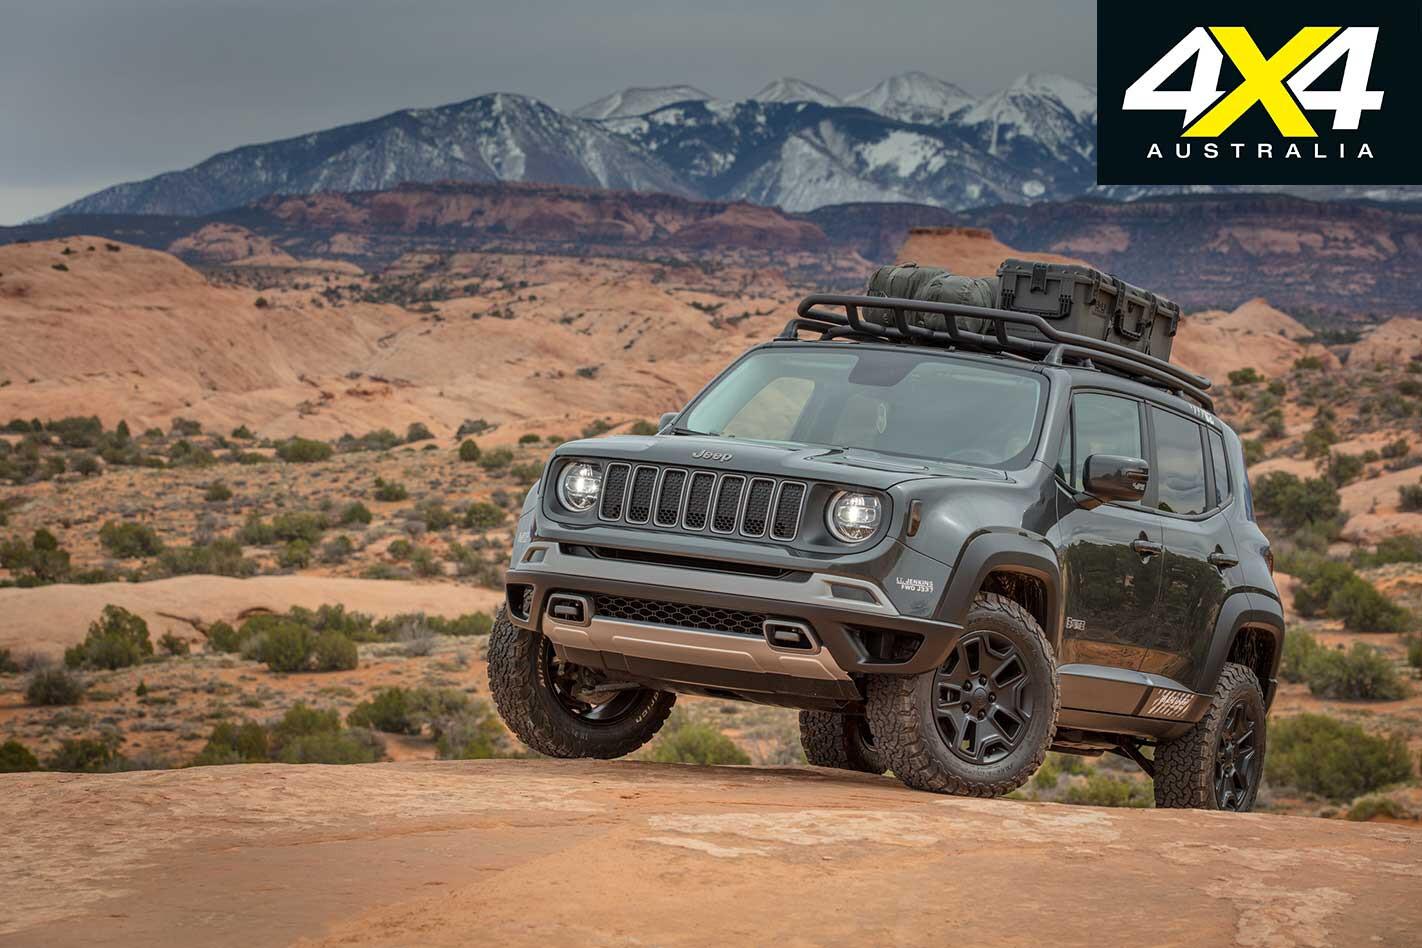 2018 Moab Easter Jeep Safari Concept 4 X 4 Highlights B Ute Jpg